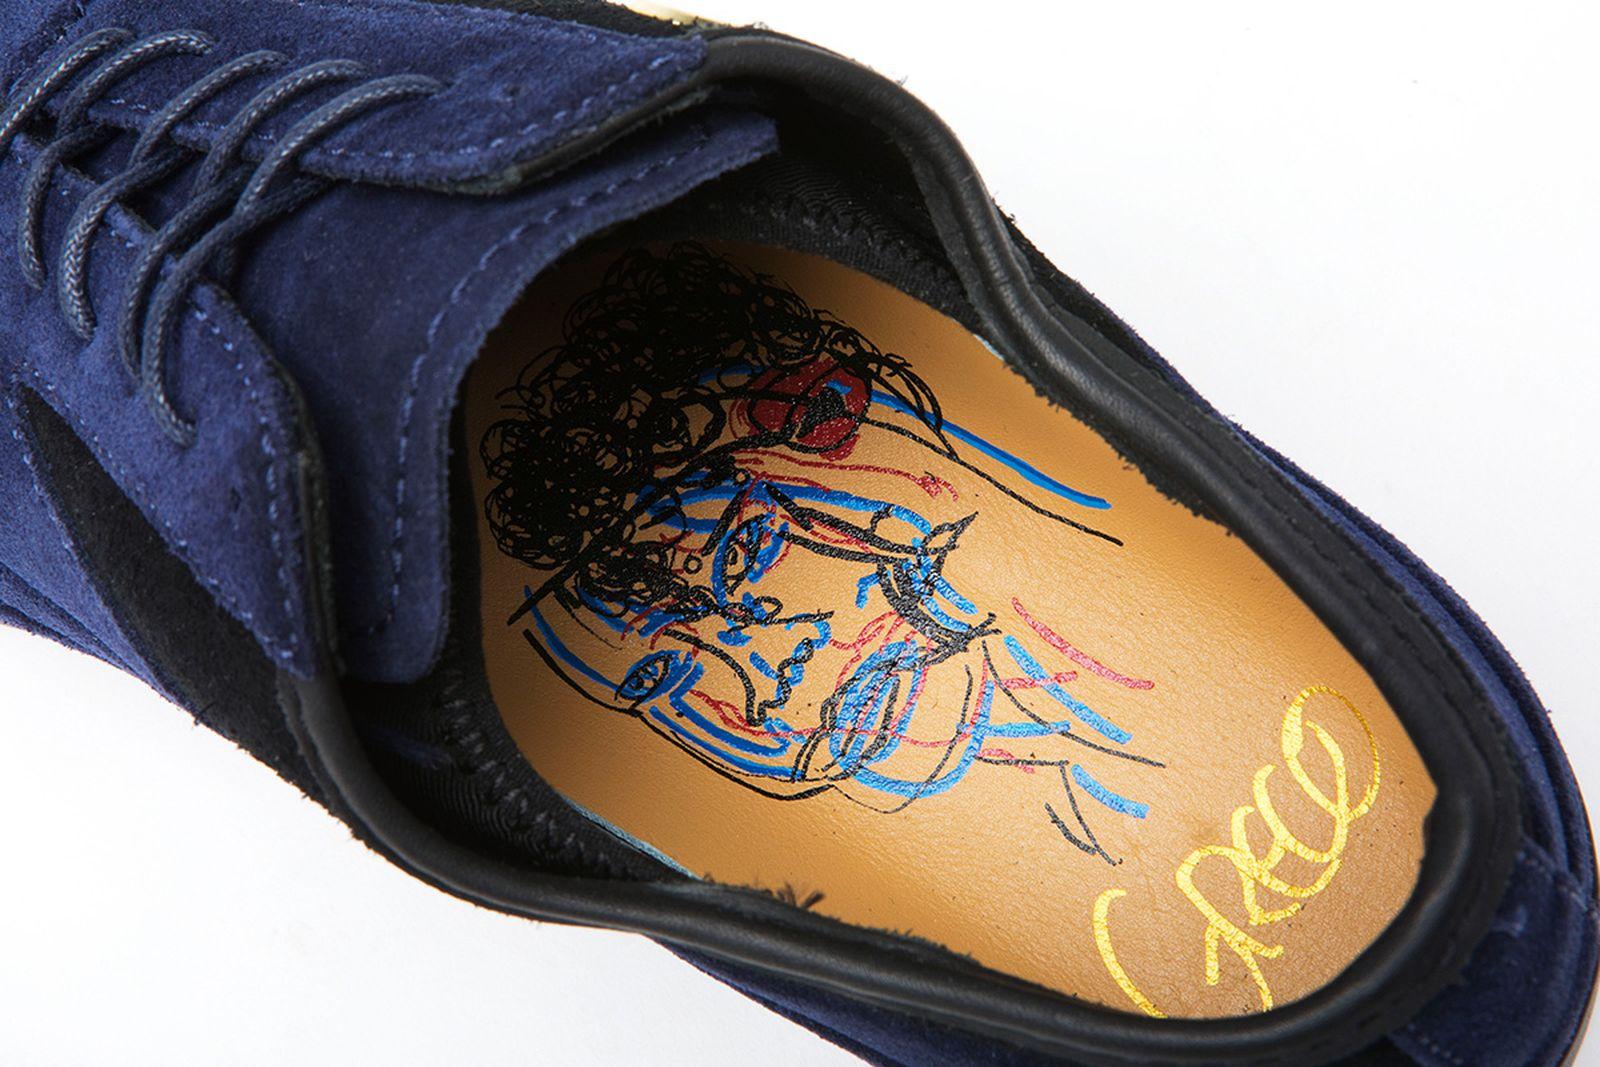 Supra Greco Sneaker release sneakers